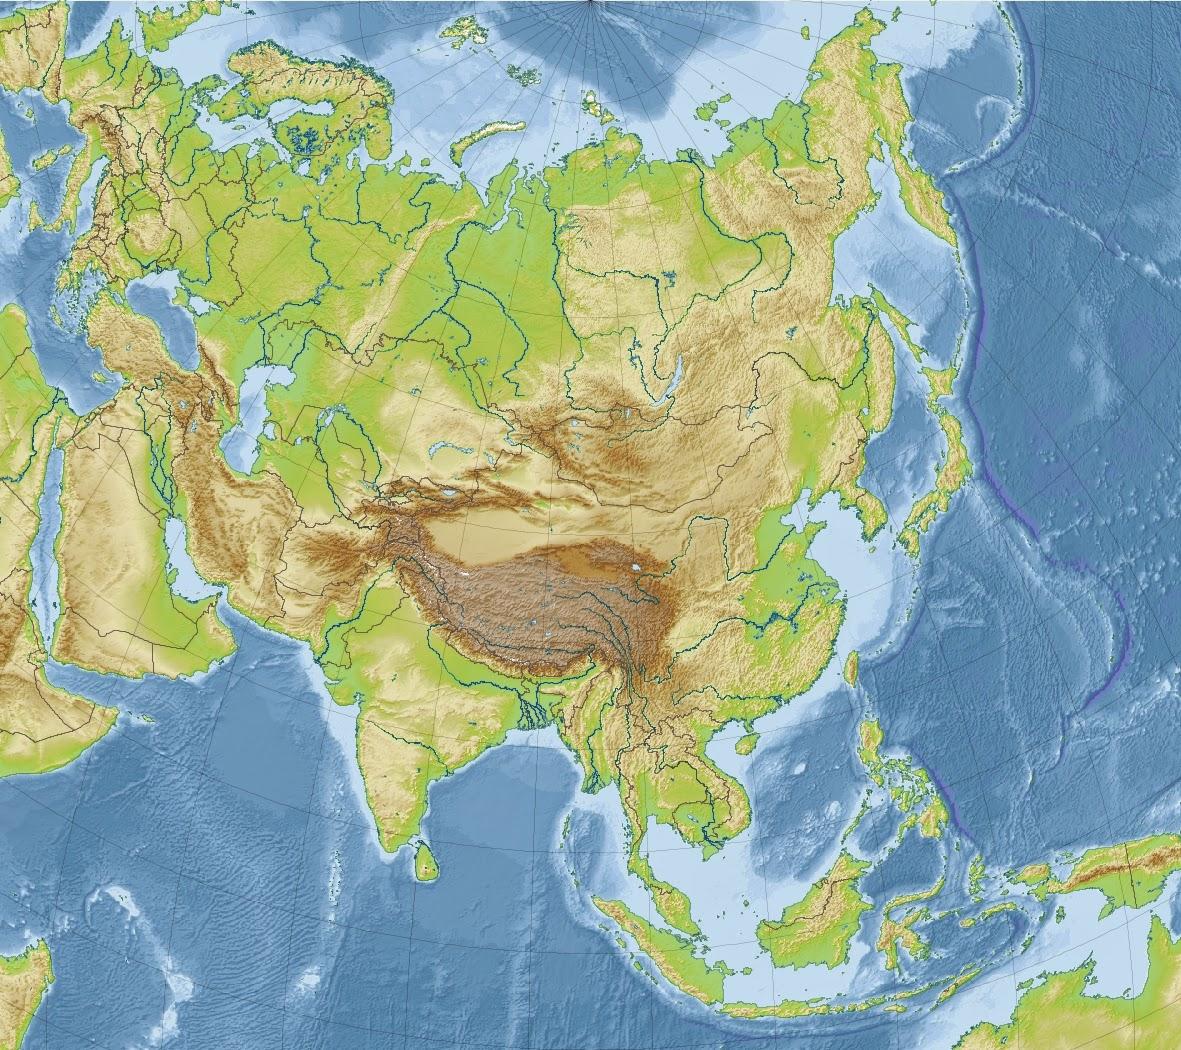 Rio Ganges Mapa Fisico.Mapa Fisico De Asia